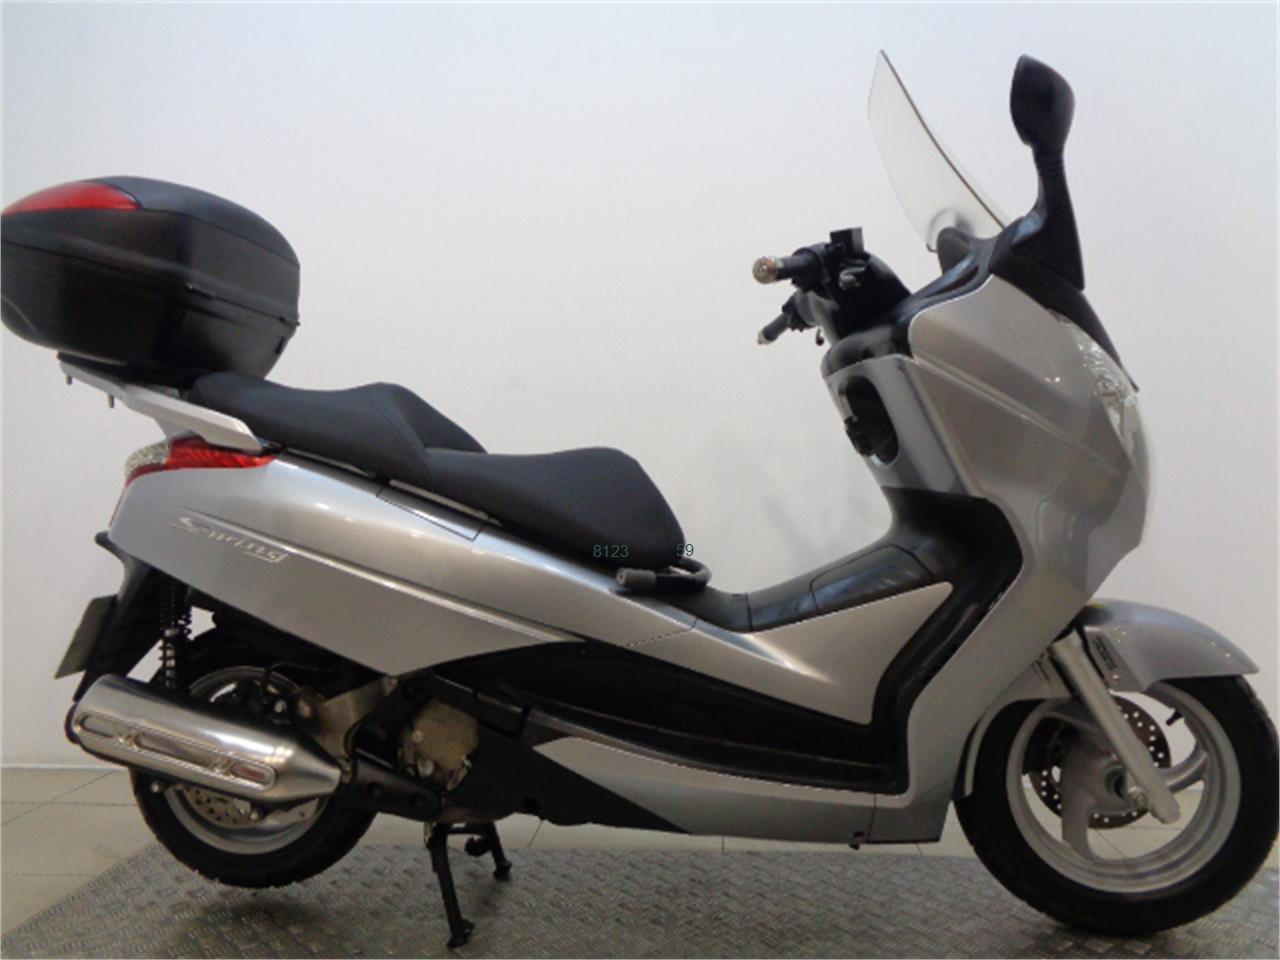 HONDA S-WING 125 C-ABS